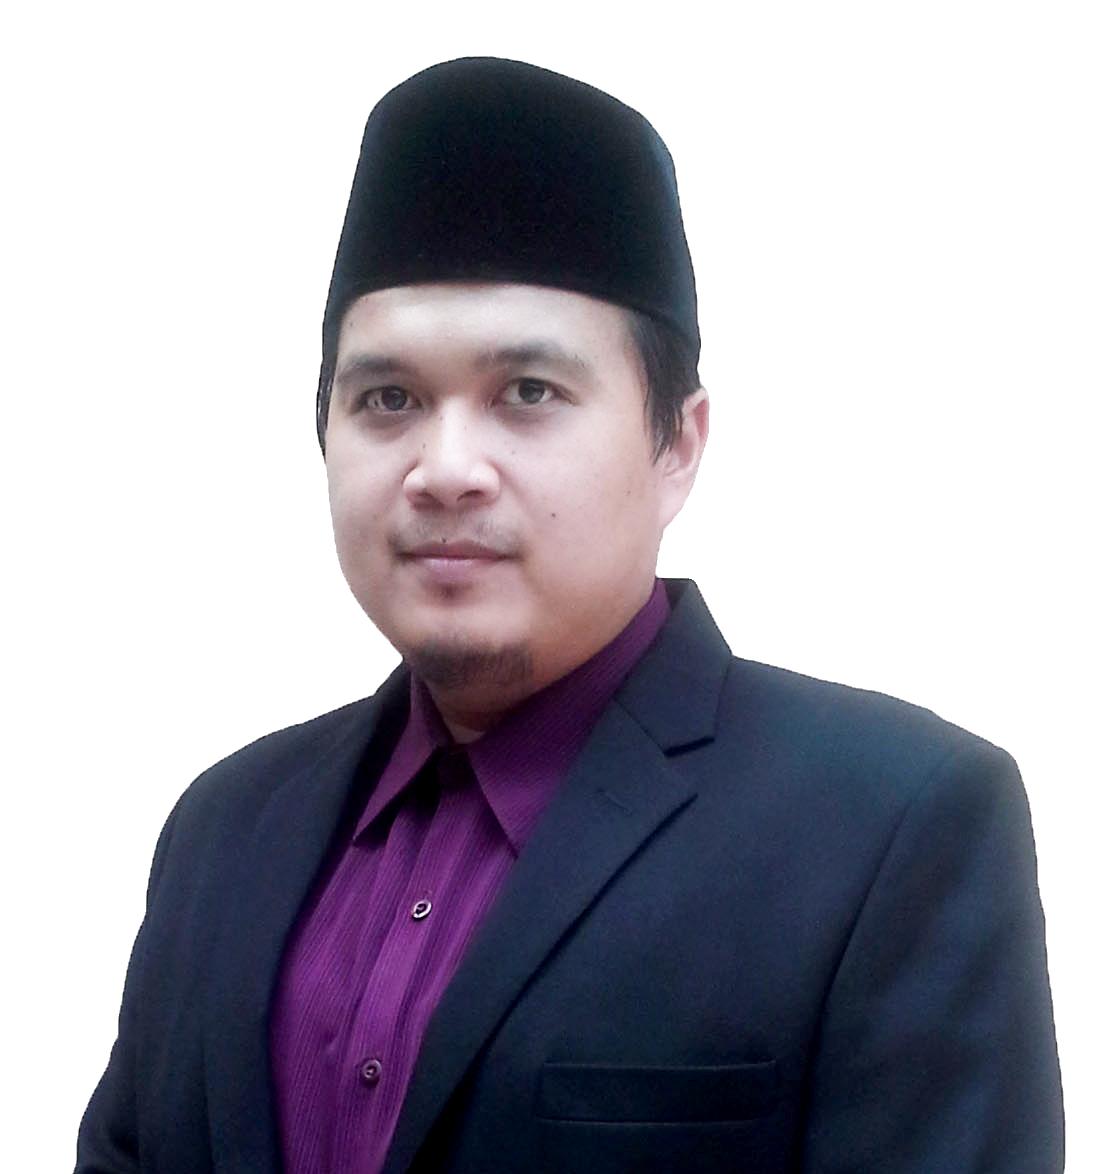 Maaz Sallim